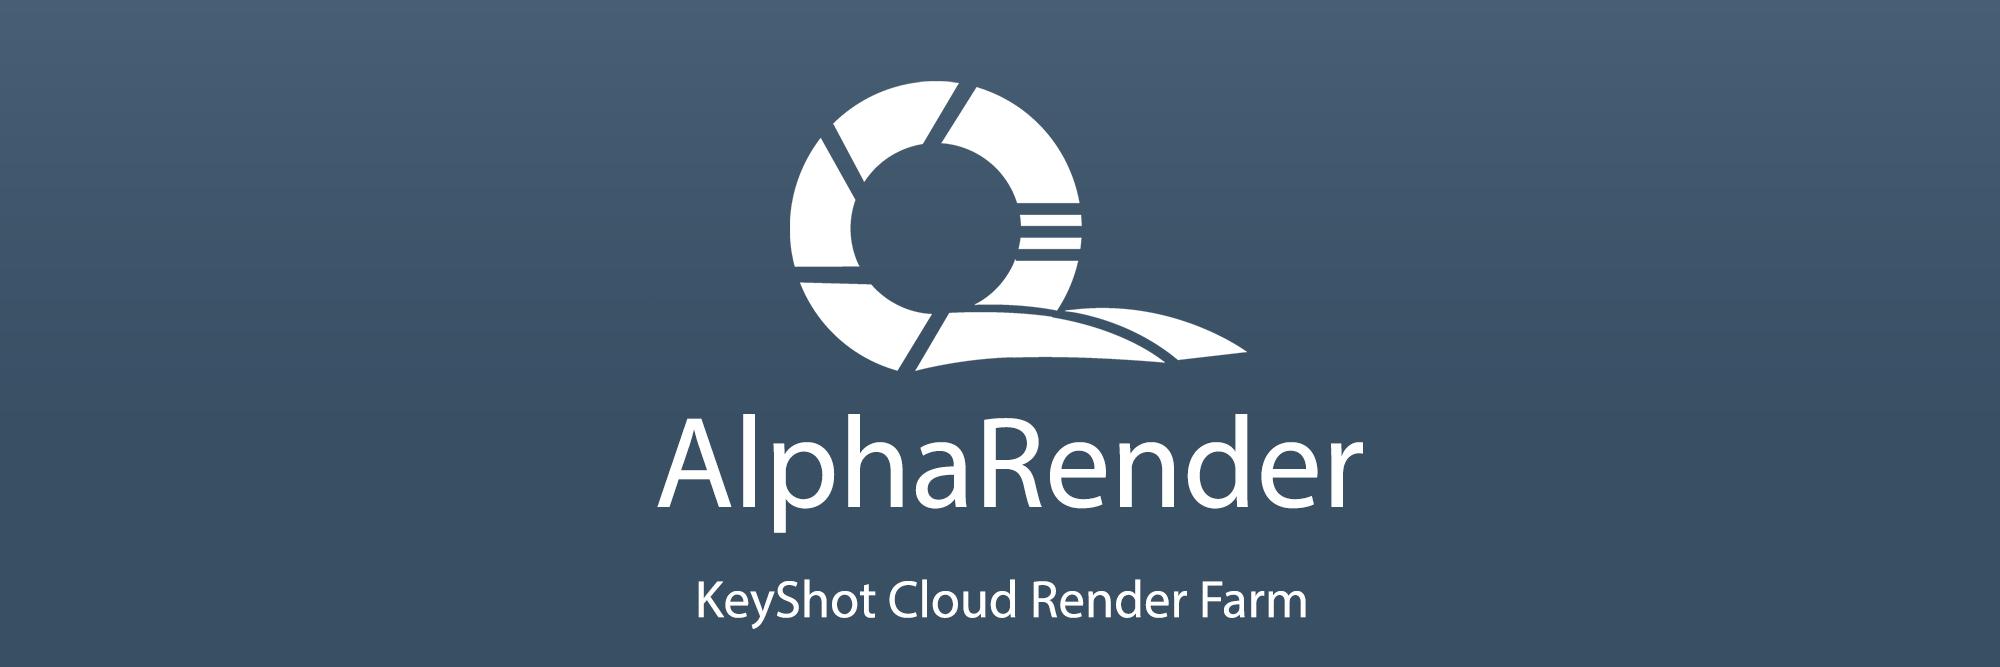 AlphaRender Services